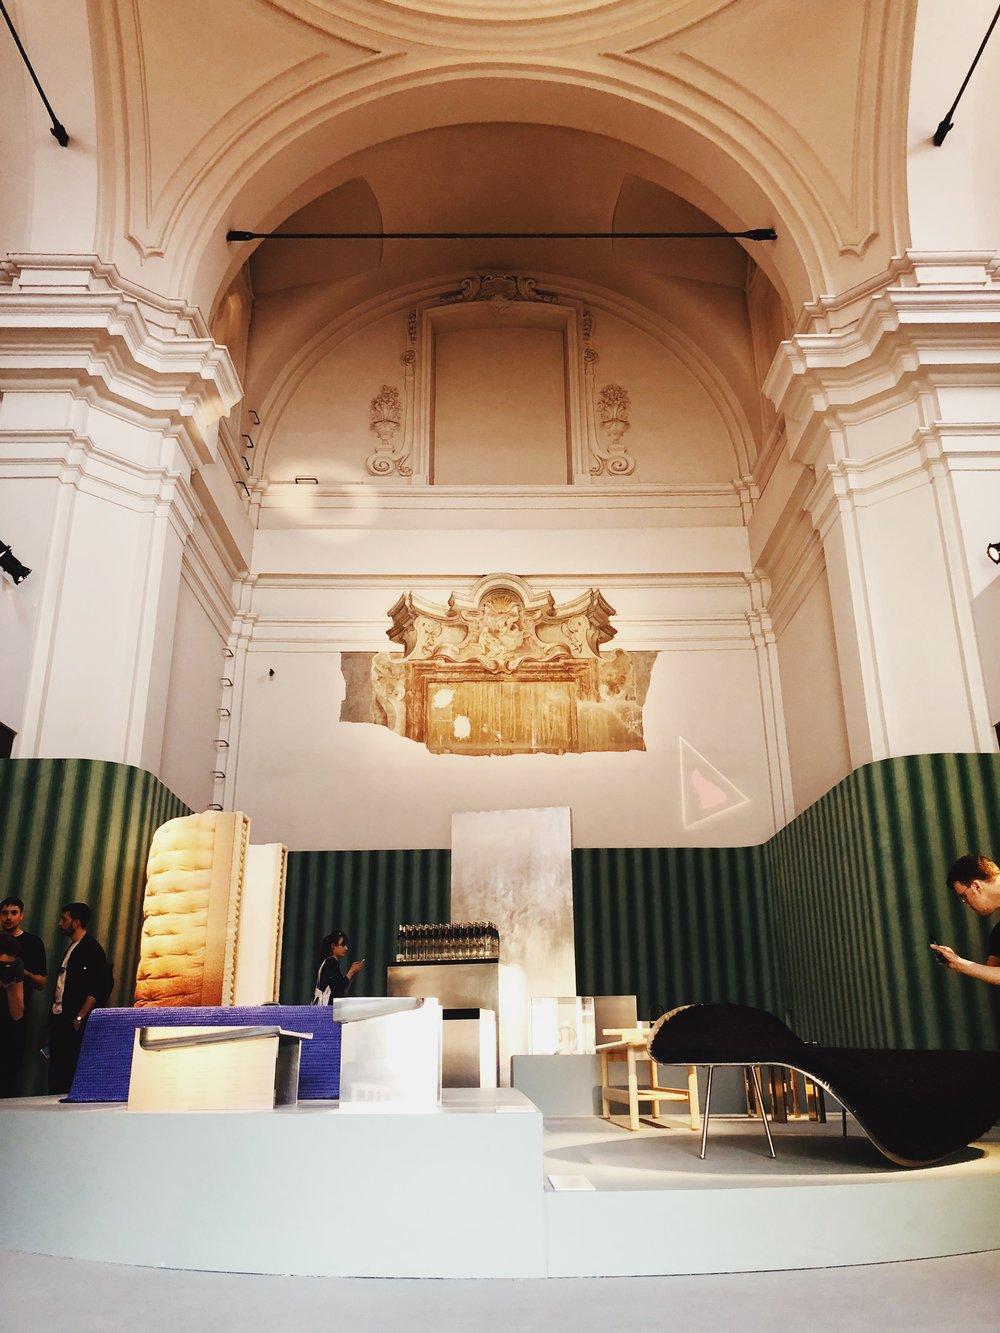 Meravigliosa Milano! Die Highlights vom Salone del Mobile 2018